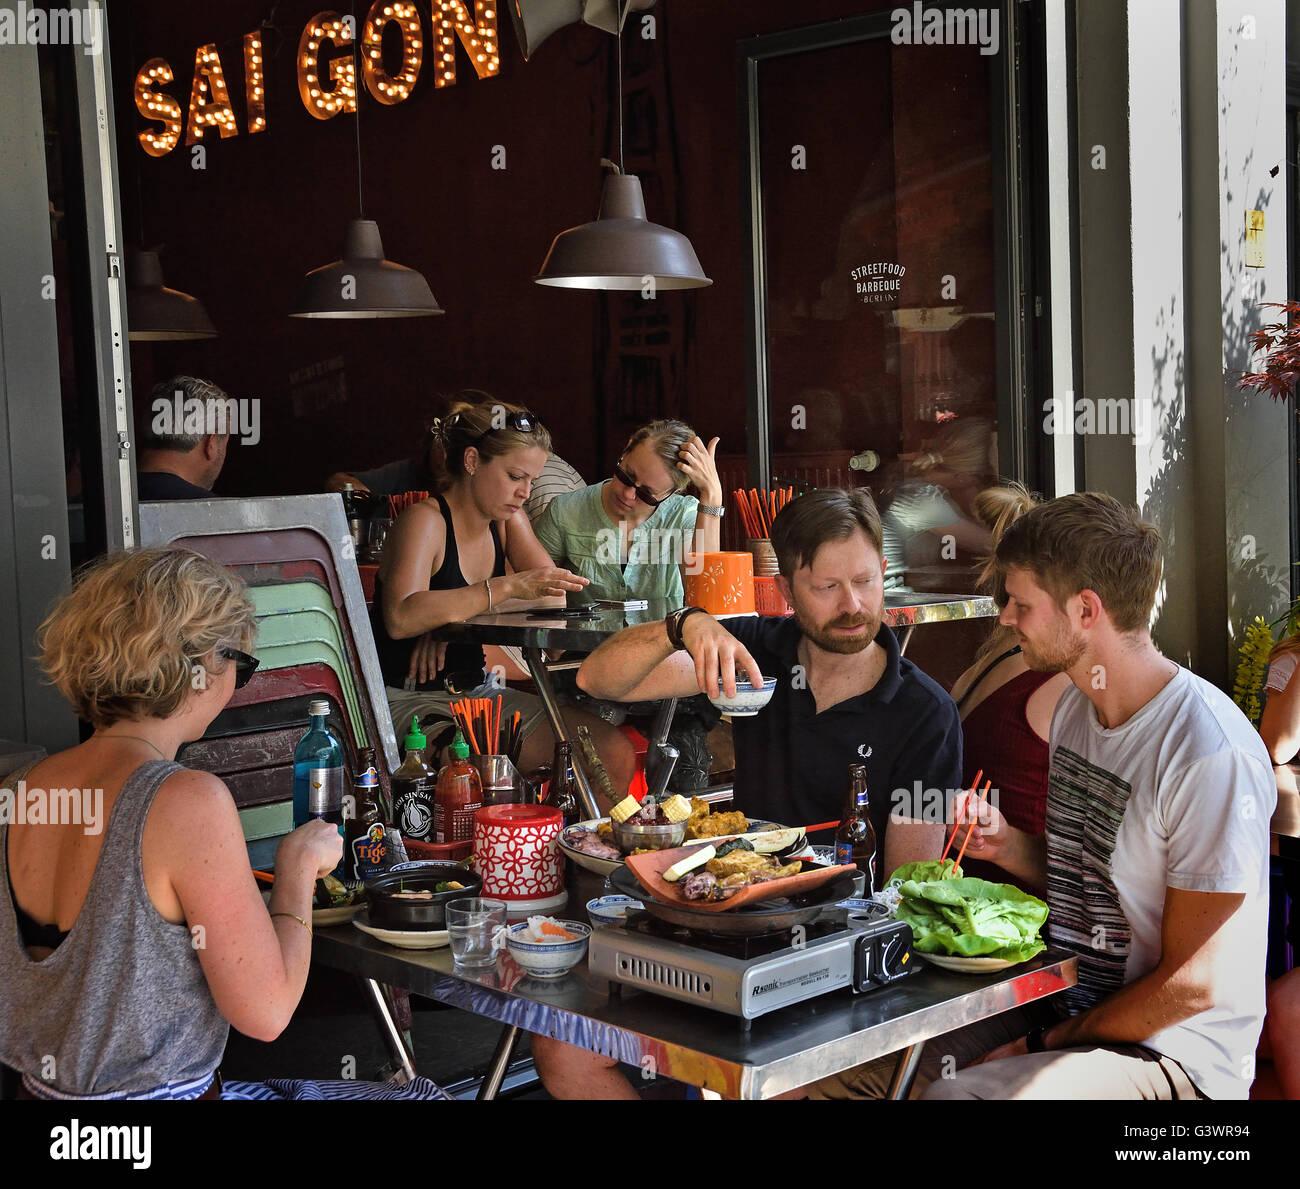 District Môt - Saigon Street Food Vietnamese Restaurant Mitte, Rosenthaler Strasse Berlin Germany Stock Photo